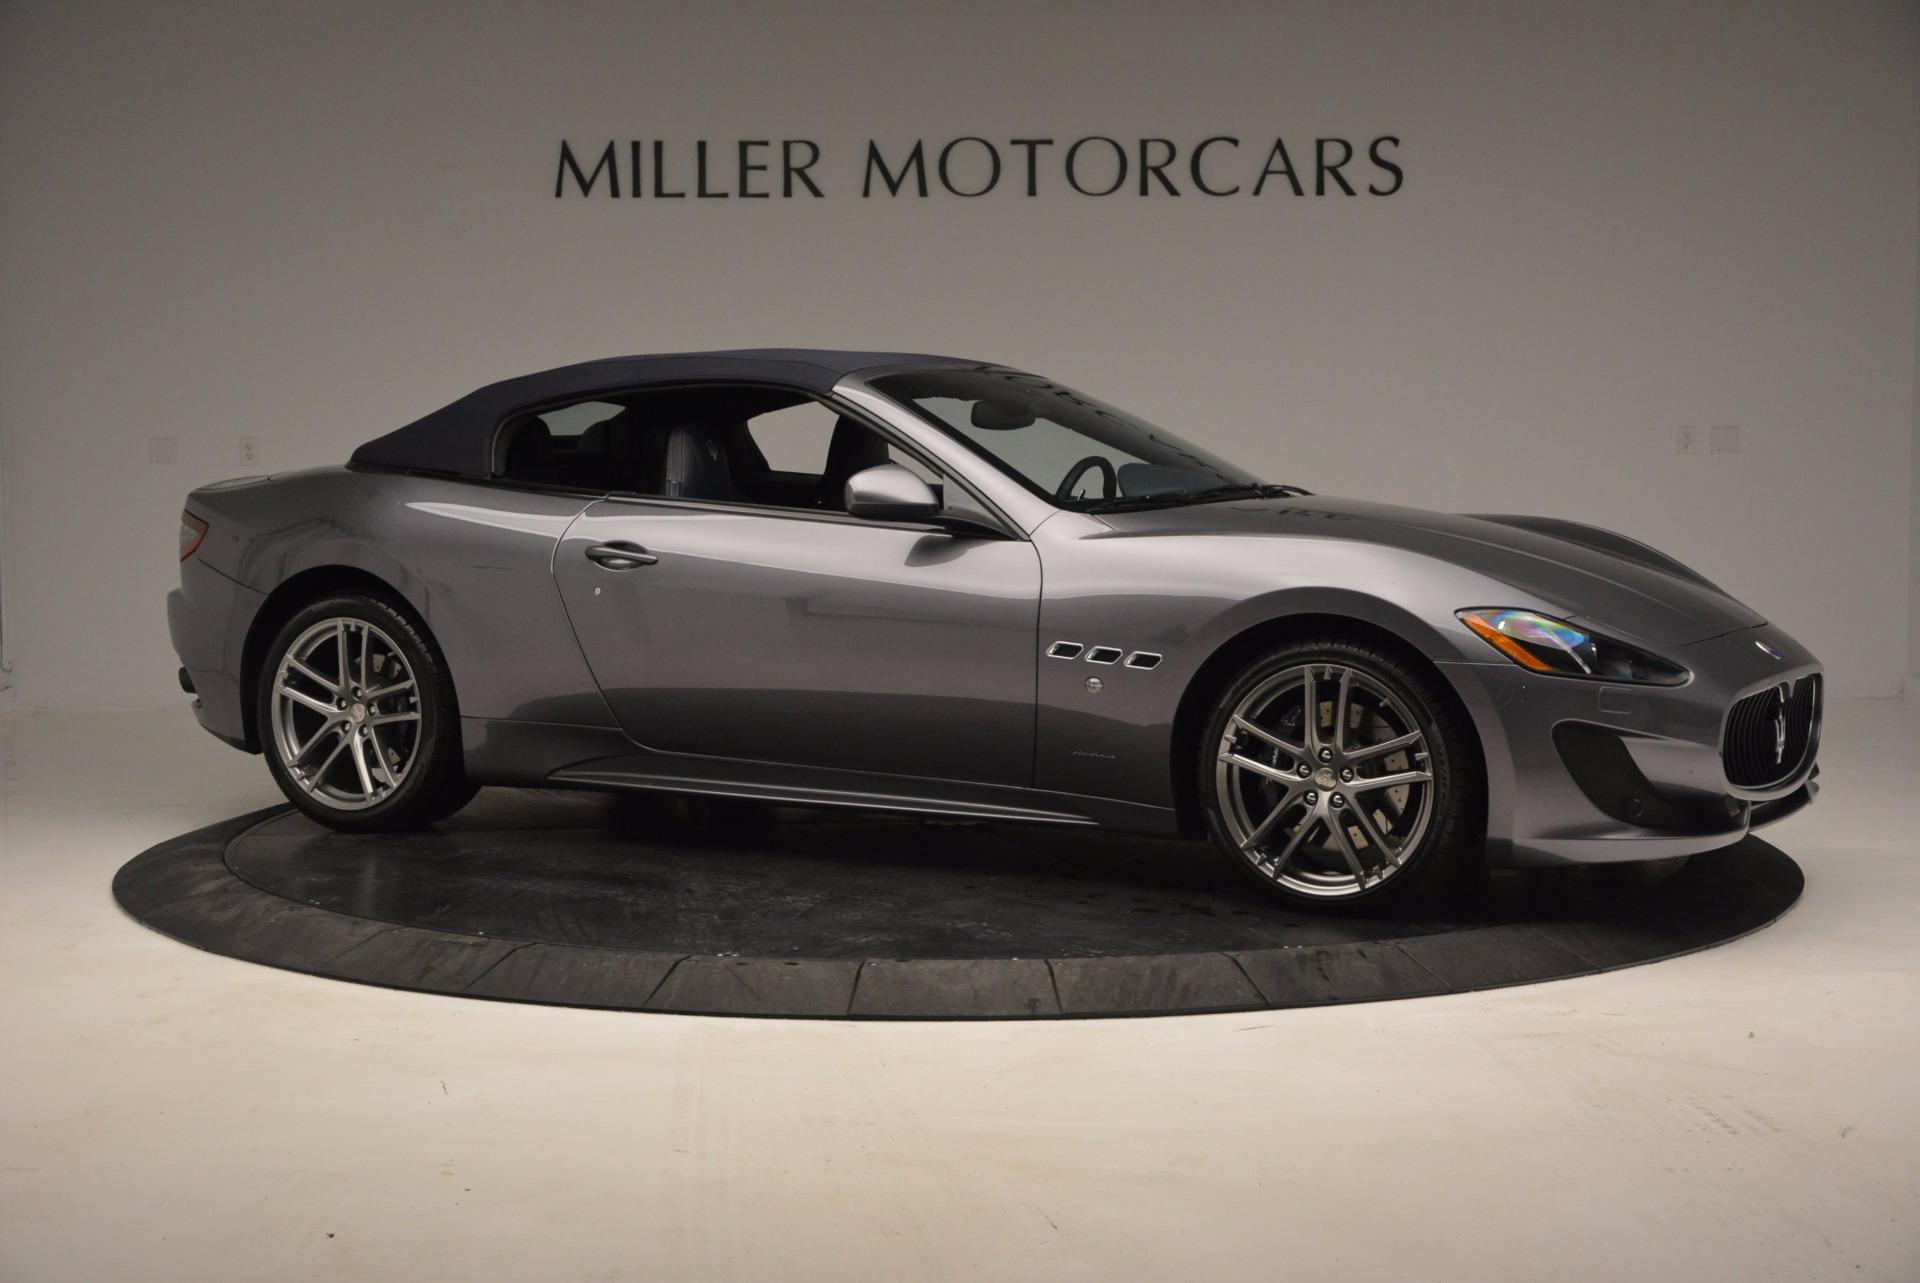 New 2016 Maserati GranTurismo Convertible Sport For Sale In Westport, CT 154_p15